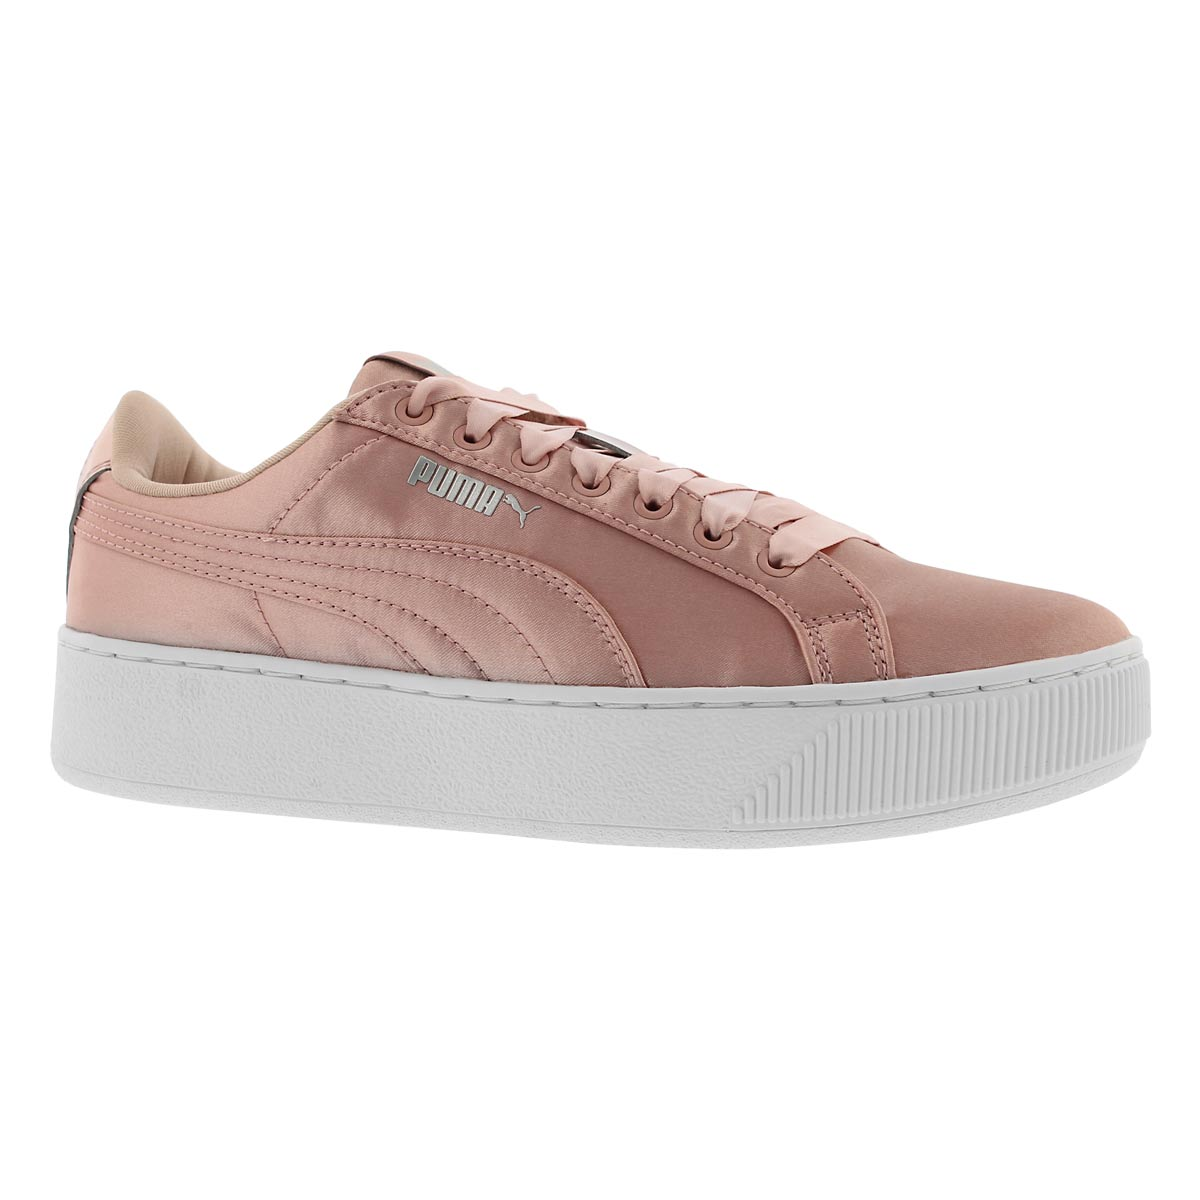 Women's PUMA VIKKY PLATFORM peach sneakers